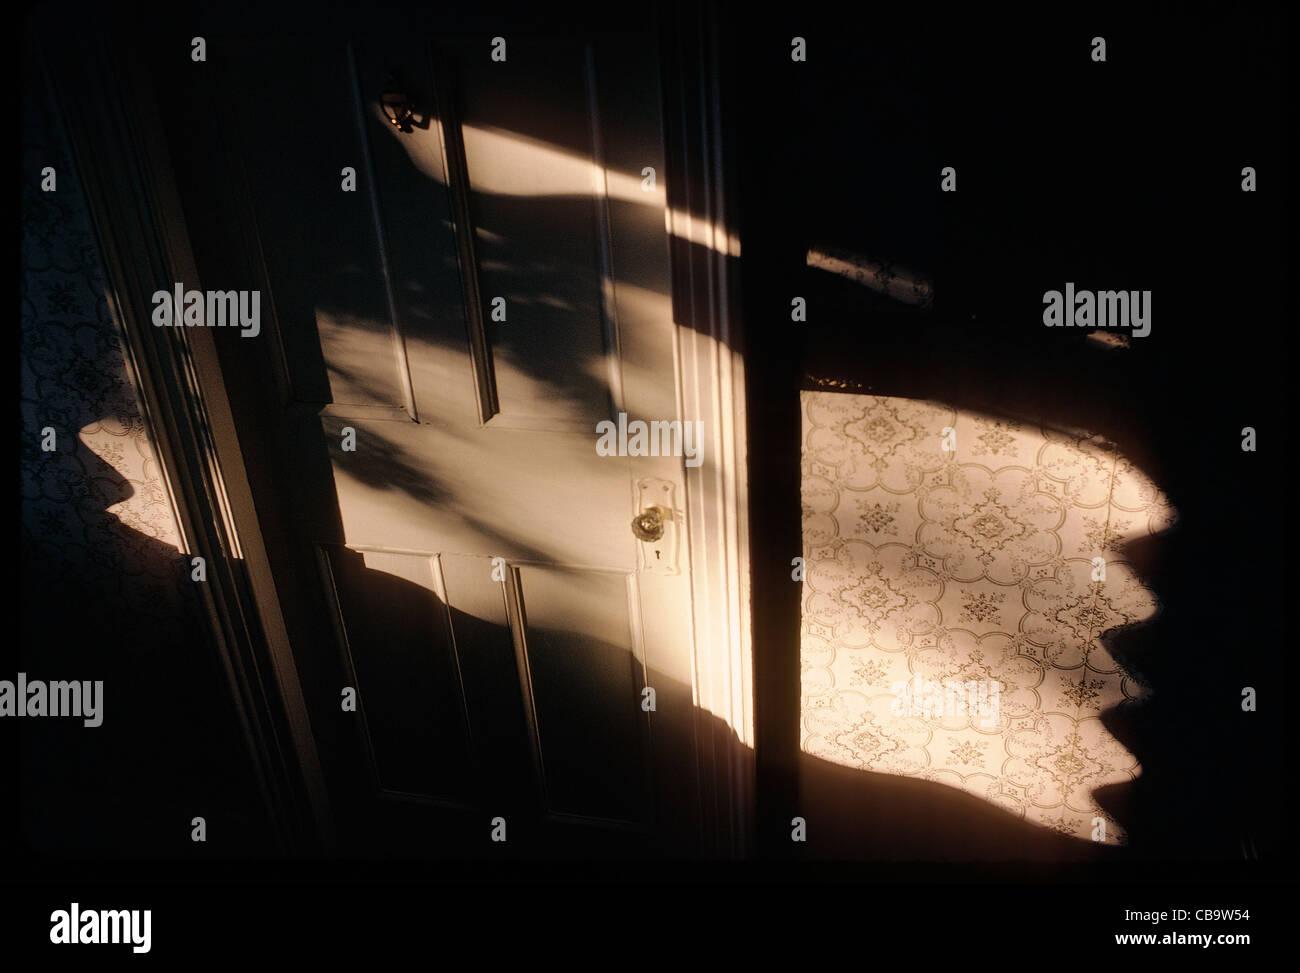 Luz y sombras en la puerta interior de un Victorian Bed & Breakfast Inn, en Edgartown, Martha's Vineyard Imagen De Stock